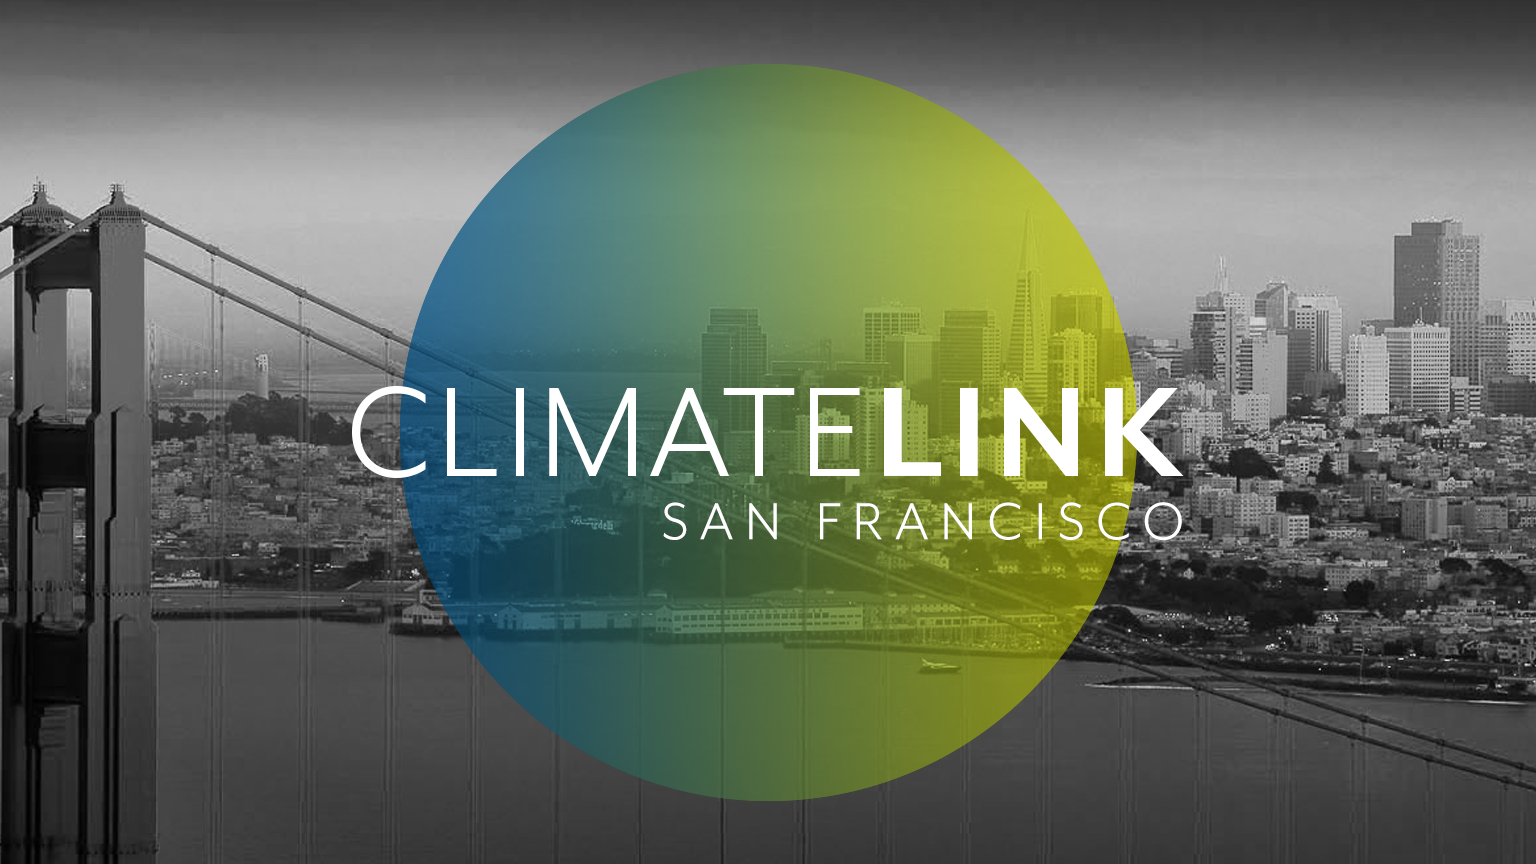 ClimateLink San Francisco